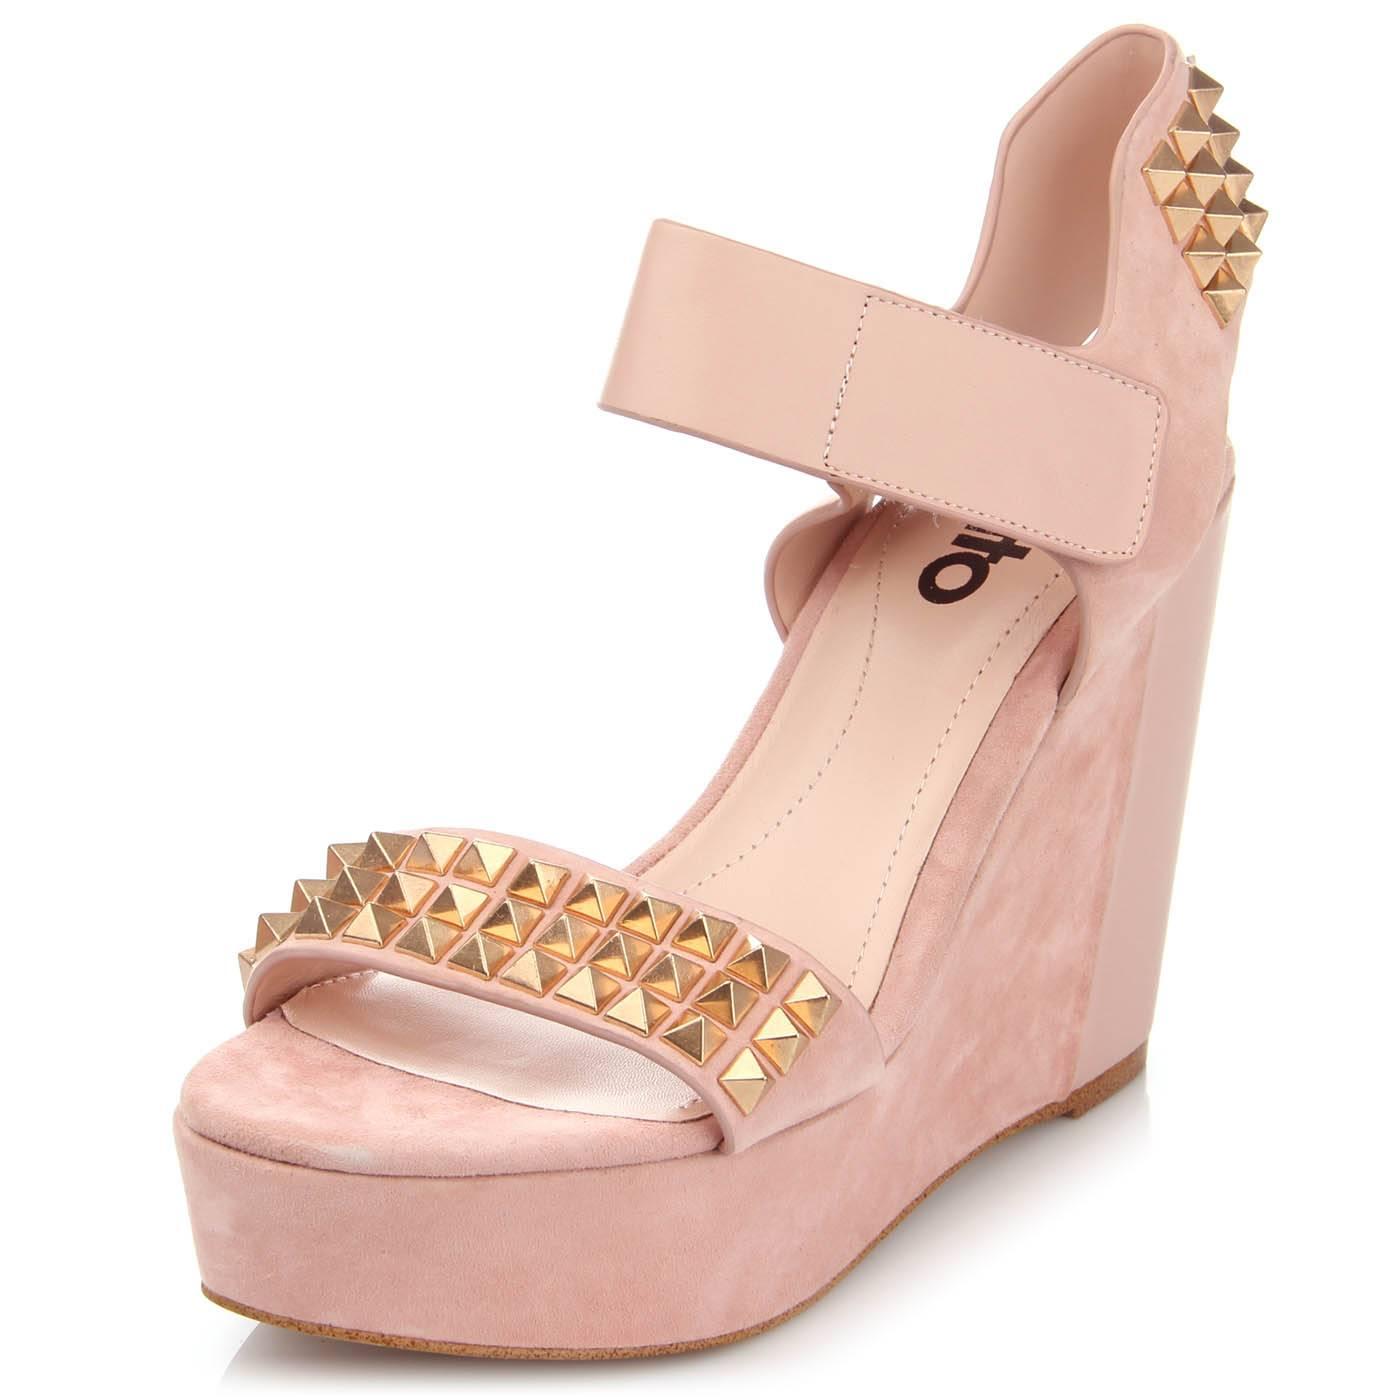 Босоніжки жіночі ditto 6792 Рожевий купить по выгодной цене в ... fa6f14f8926c1